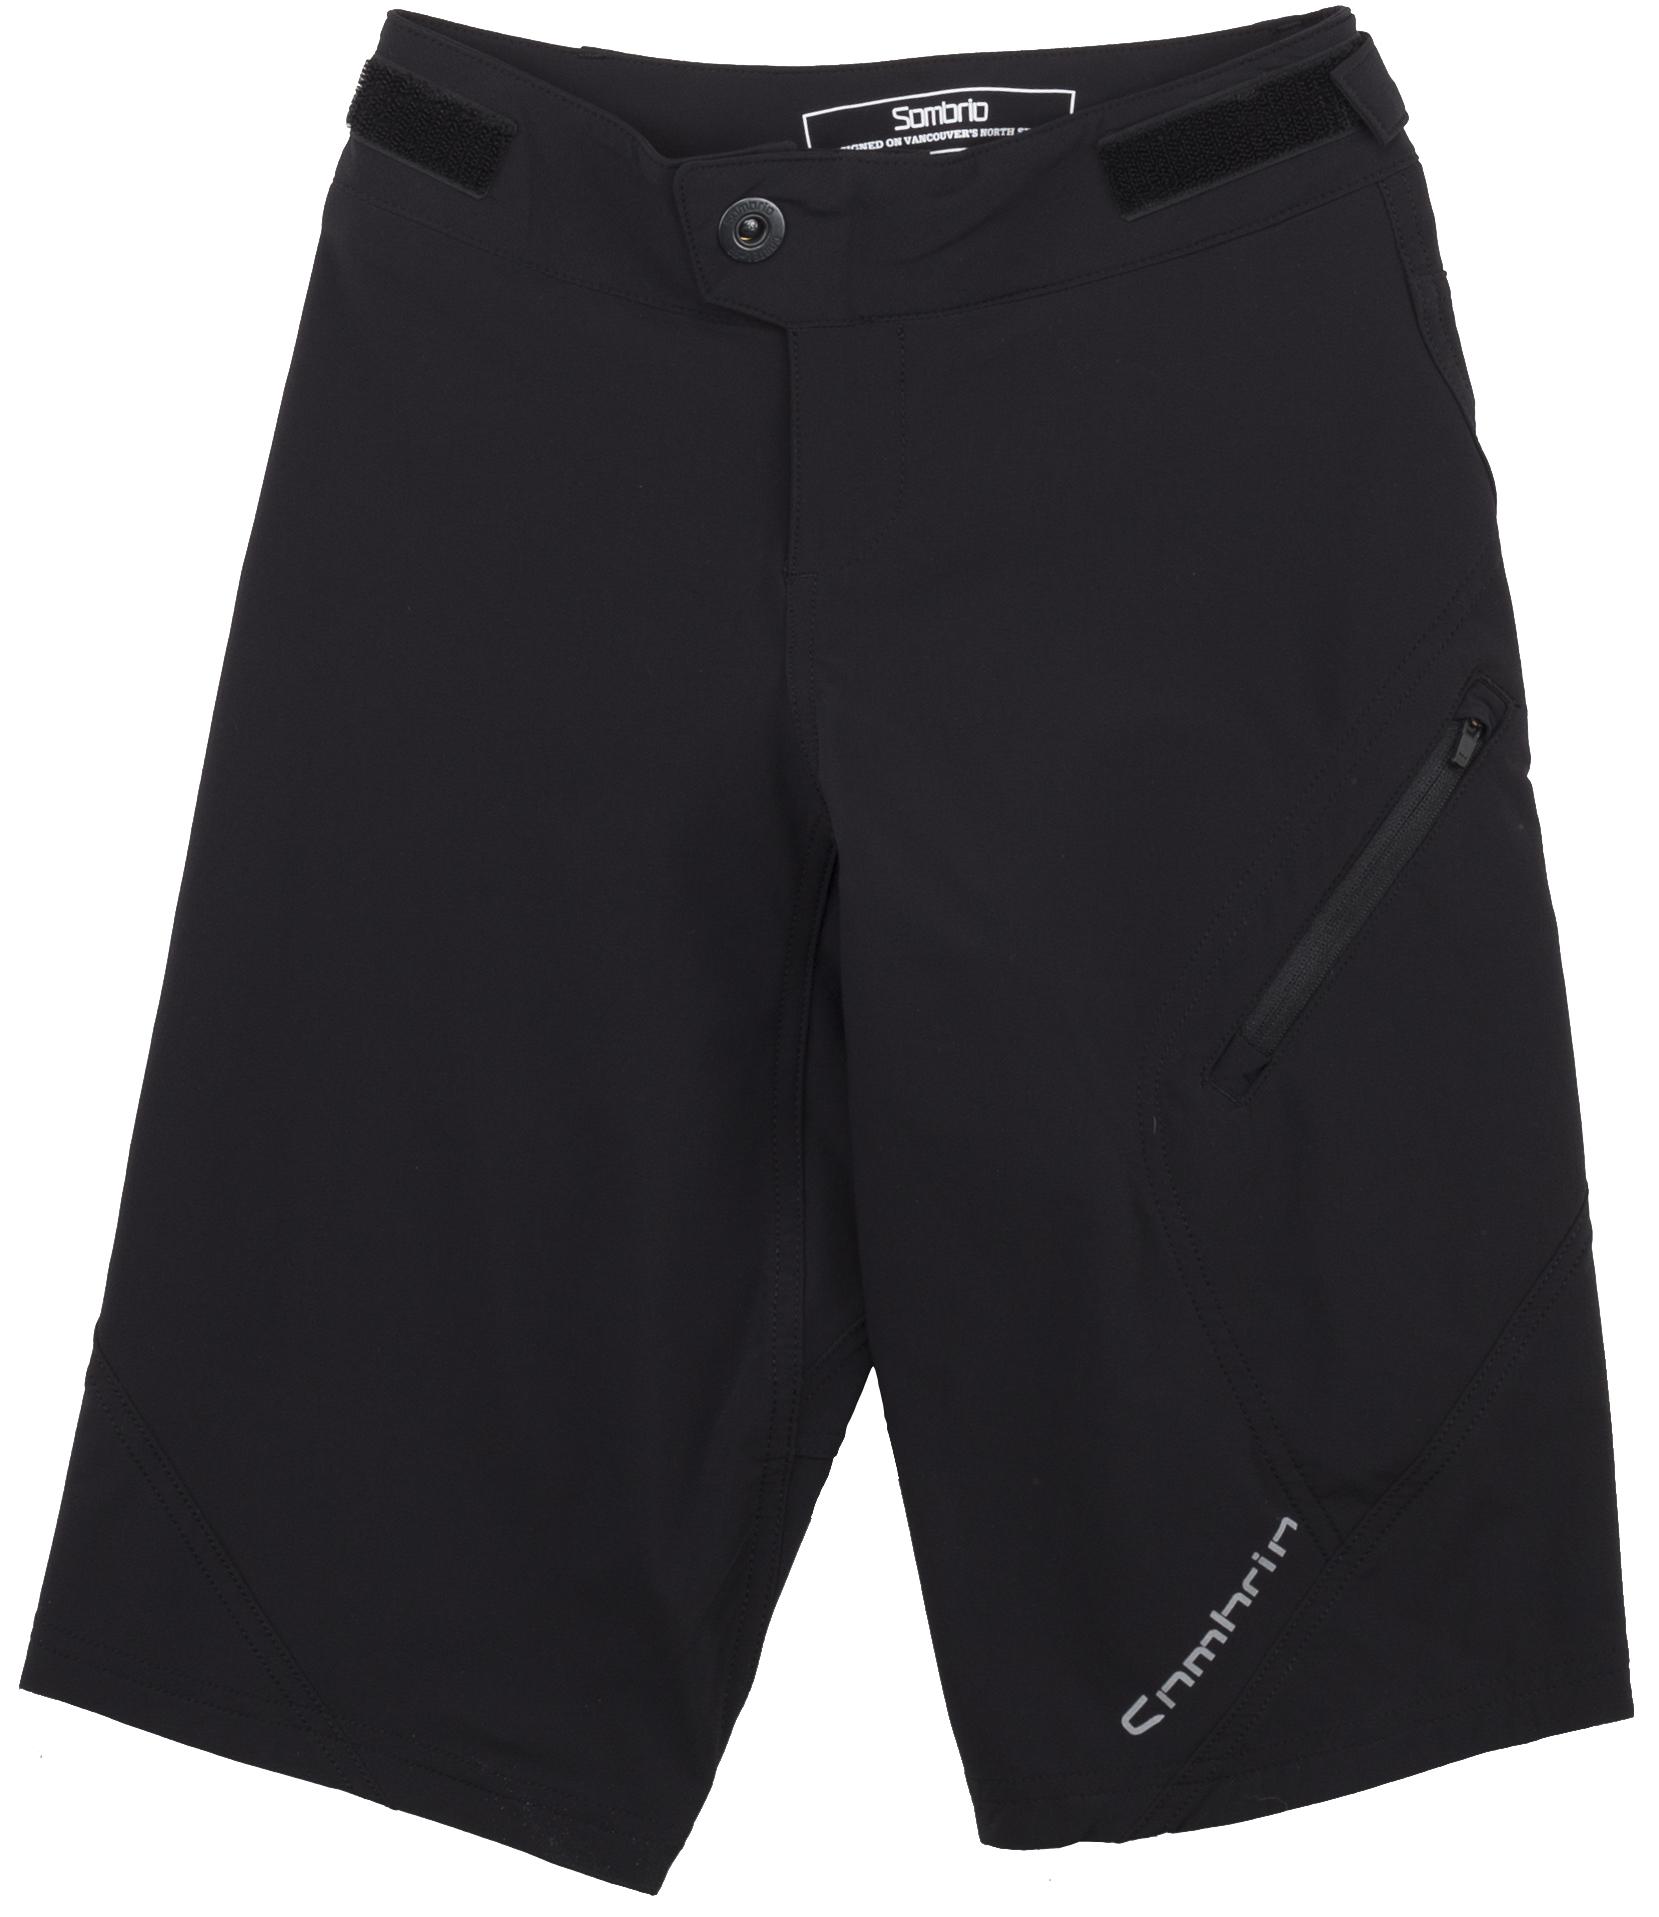 Sombrio Groms Badass MTB Shorts